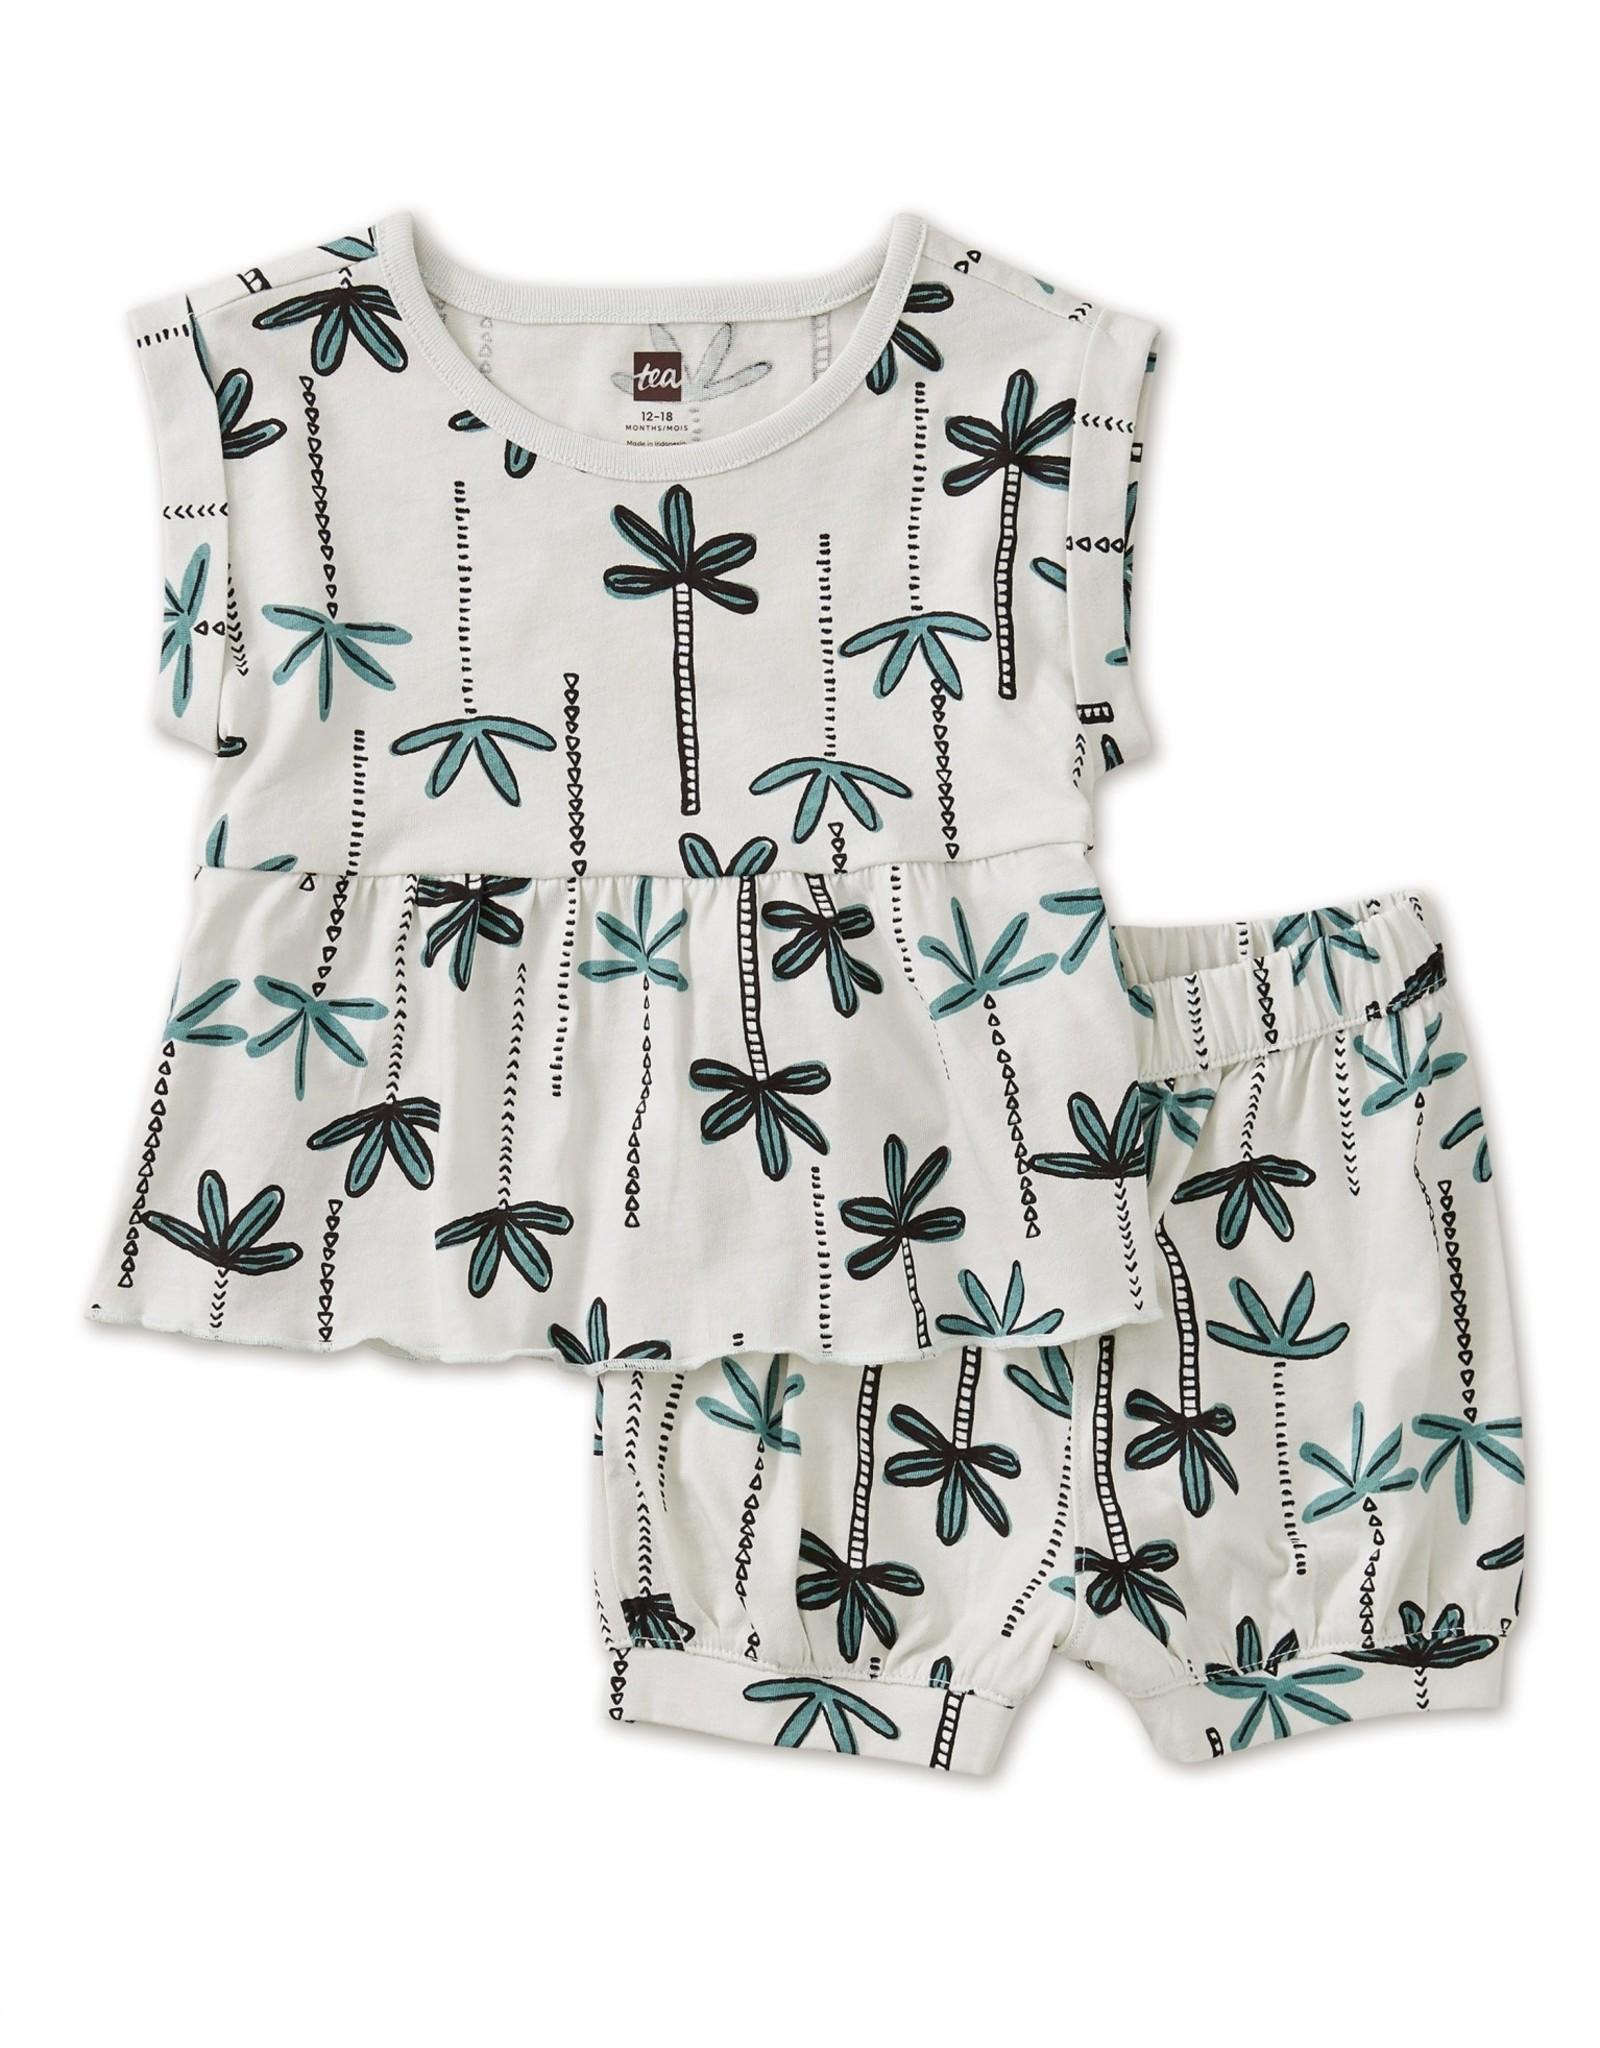 Tea Collection TEA Palm Print Baby Set, Nile Palms